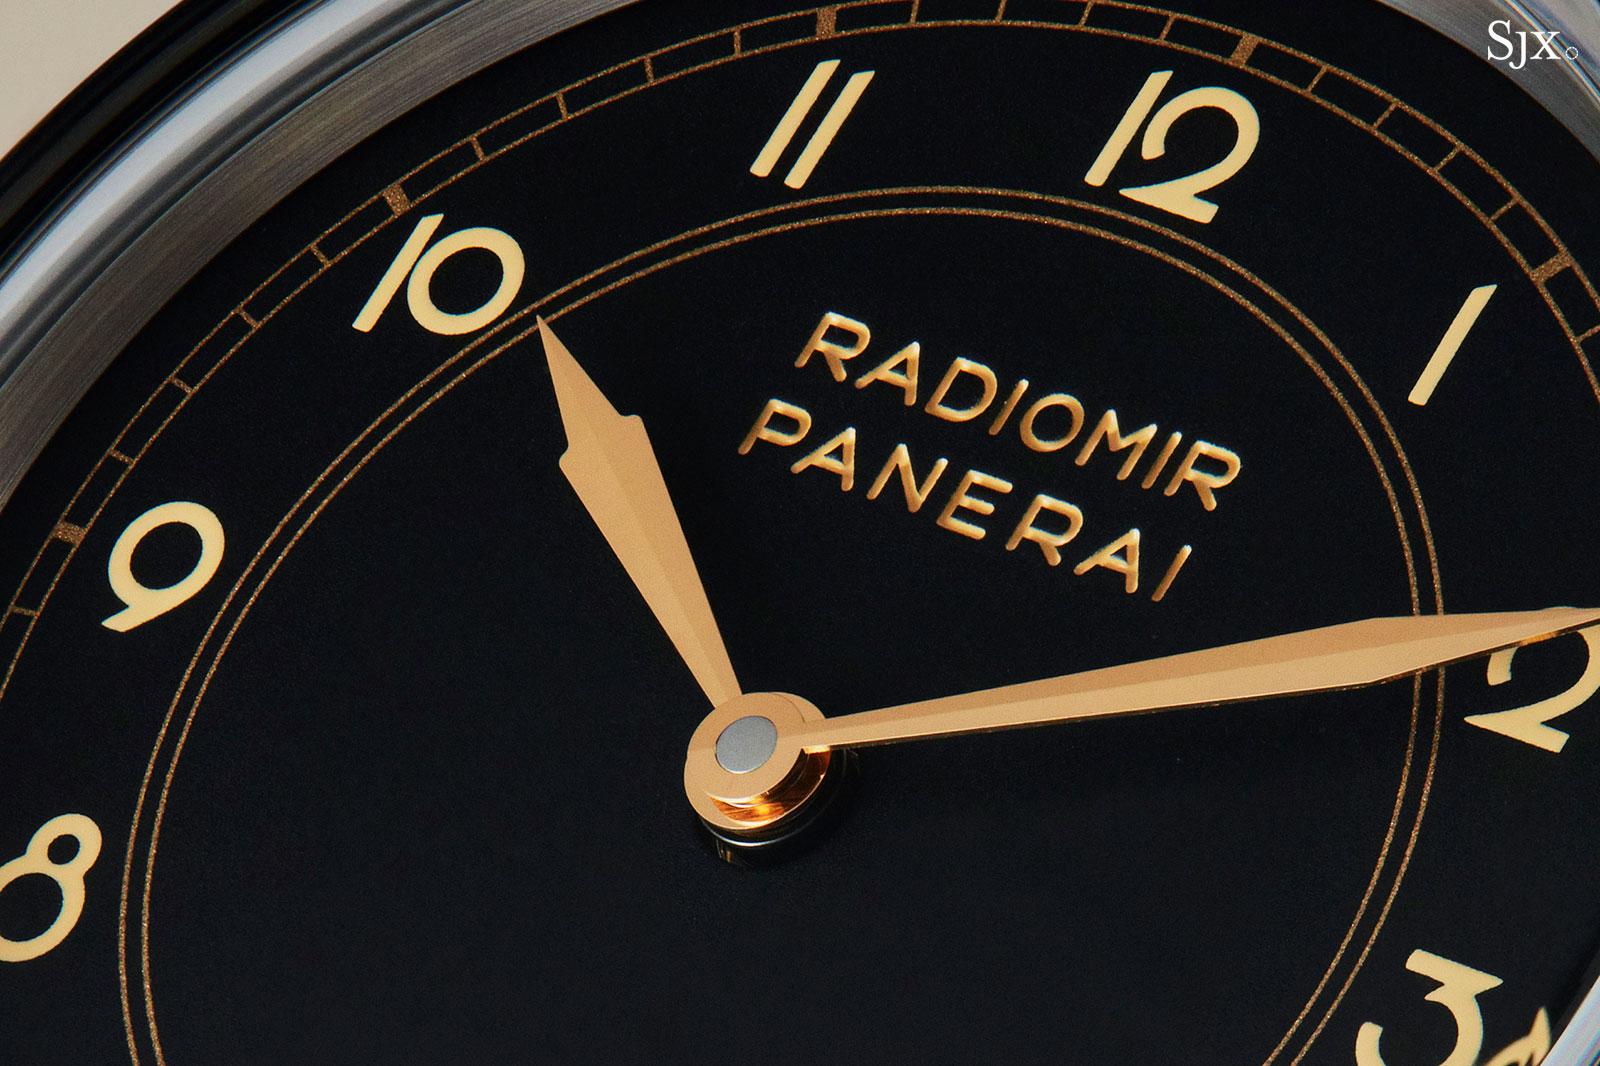 Panerai Radiomir 1940 art deco PAM 790